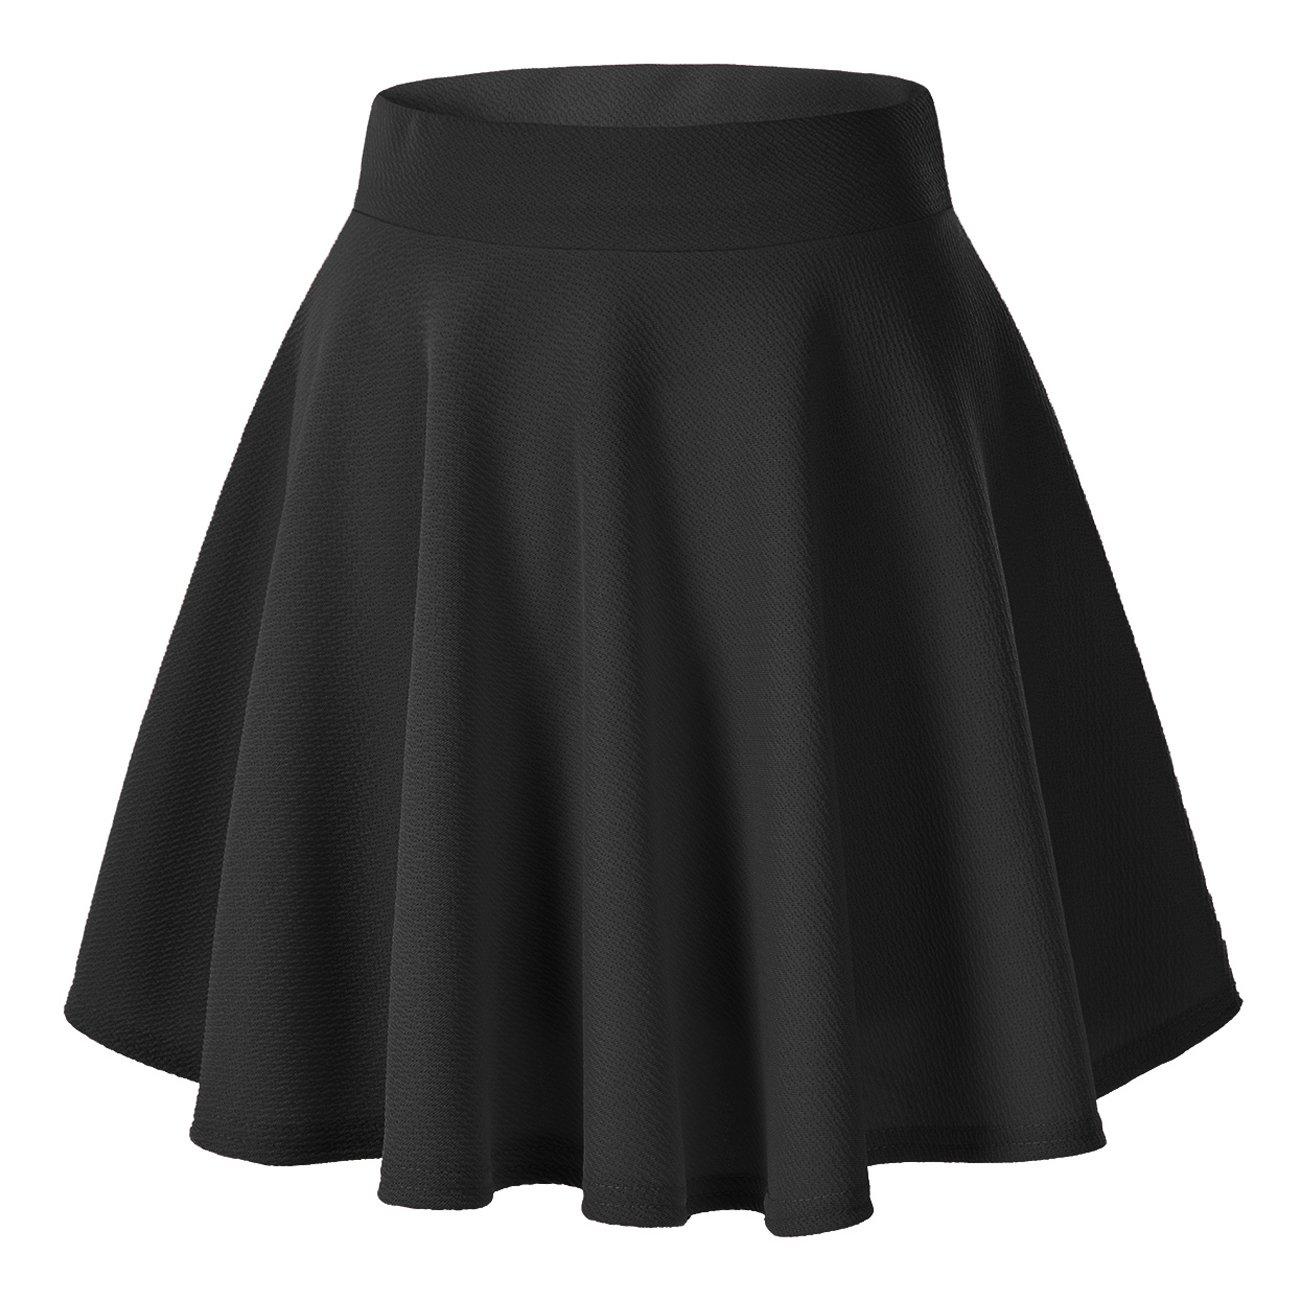 Urban CoCo Women's Basic Versatile Stretchy Flared Casual Mini Skater Skirt (Large, Black)